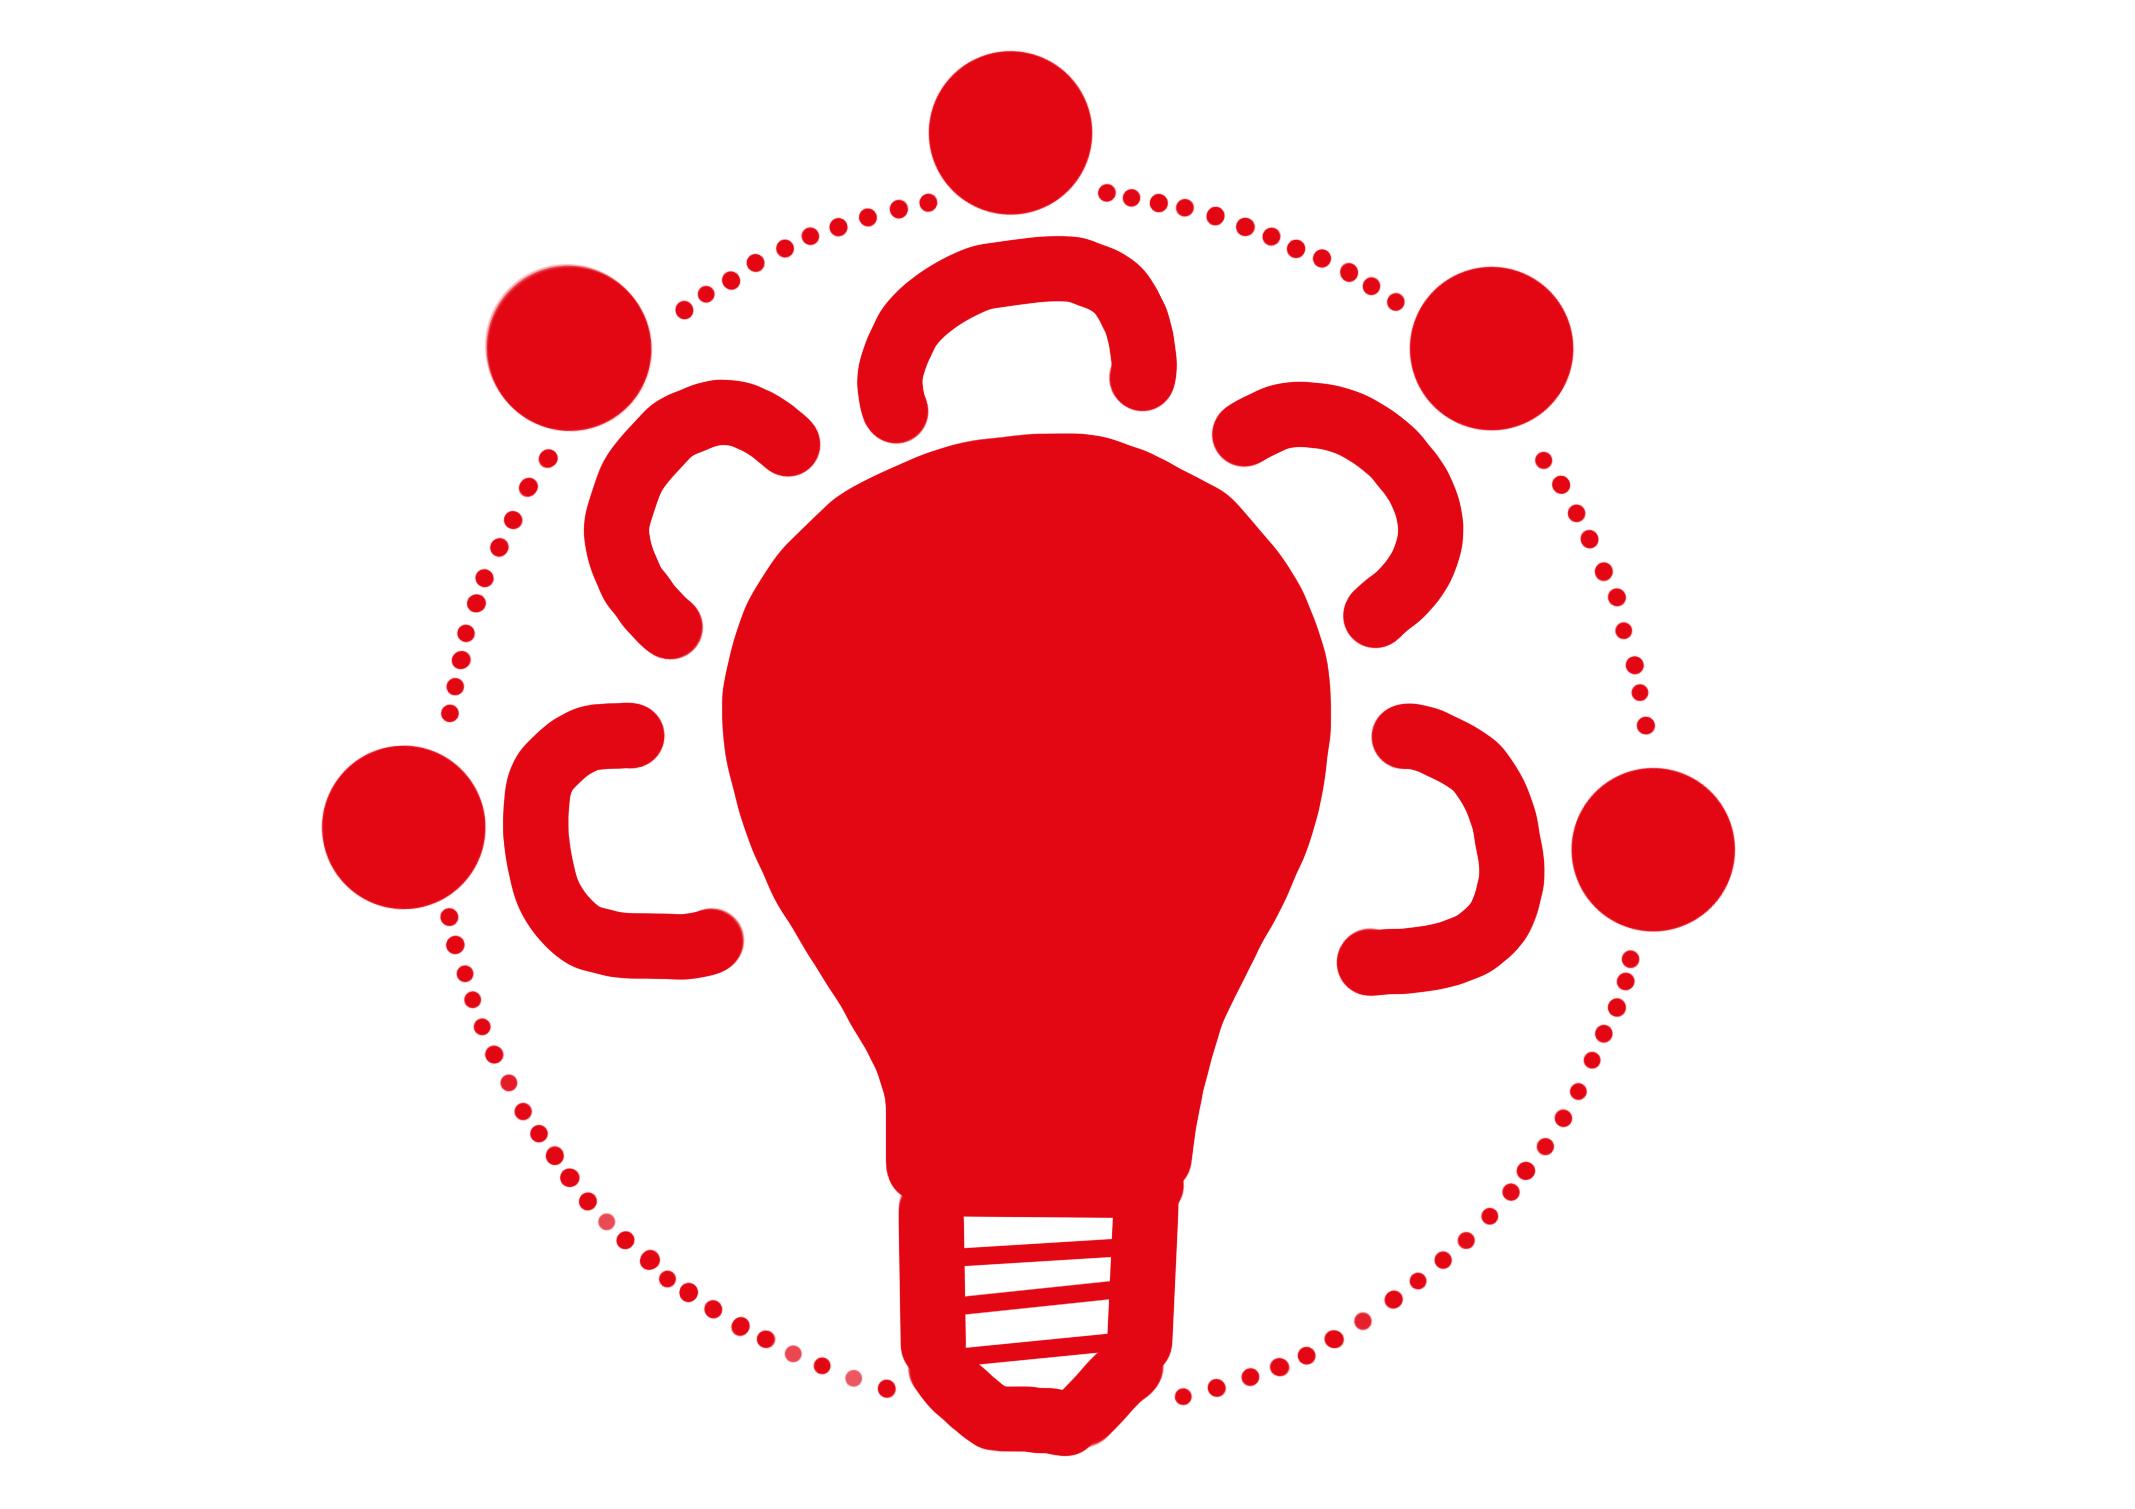 Innovatie-workshop facilitatie -